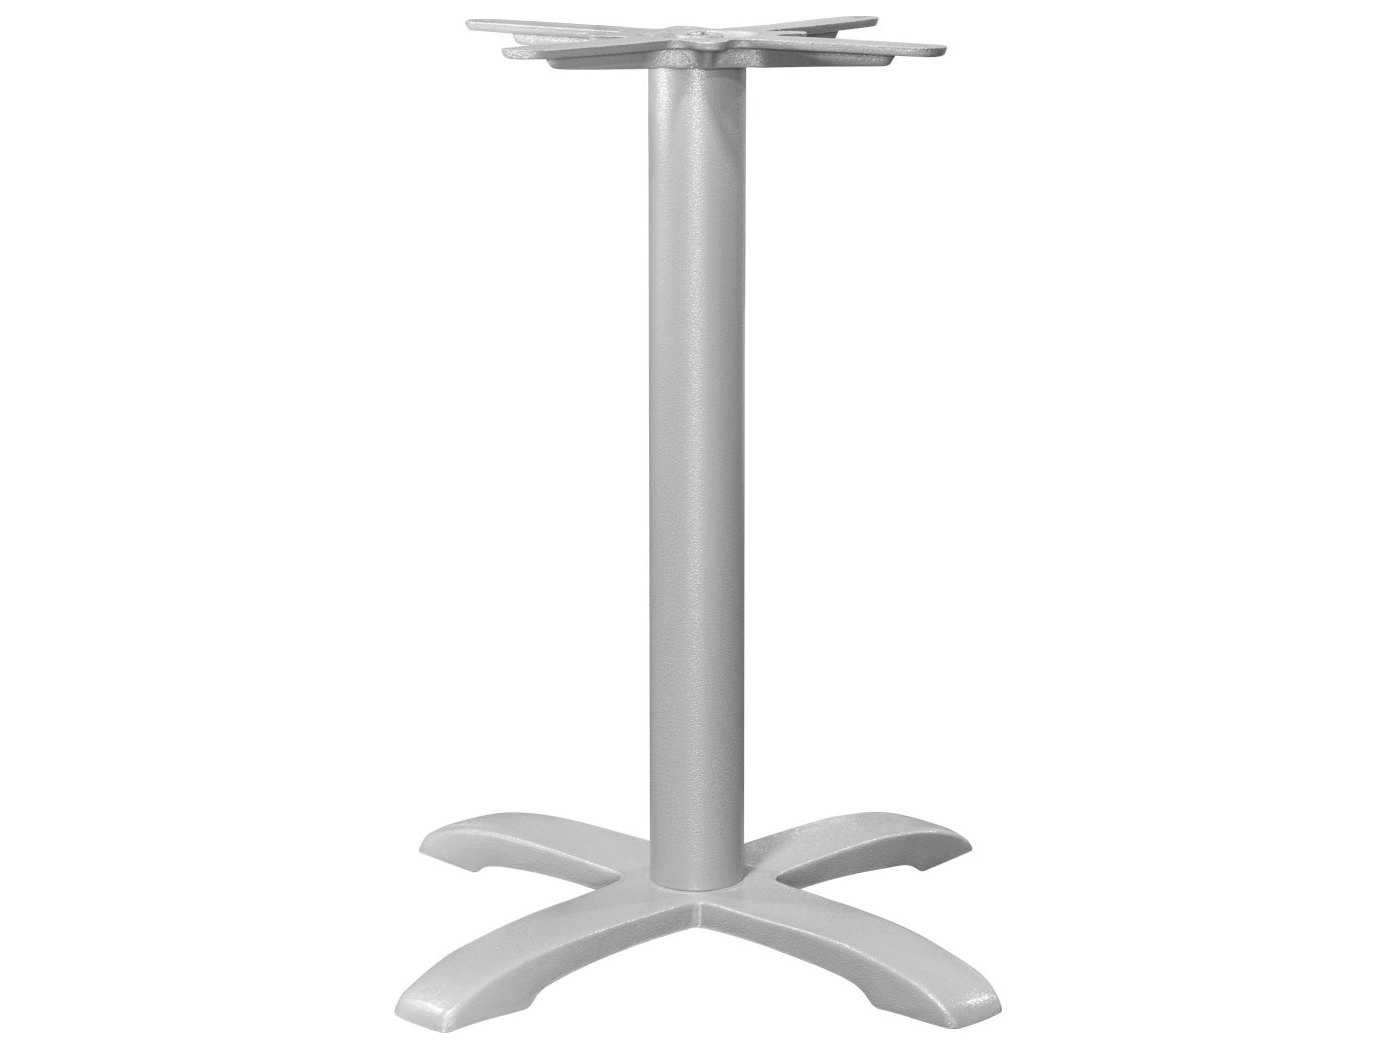 source outdoor furniture sierra wicker. source outdoor furniture sierra wicker t flmb in design